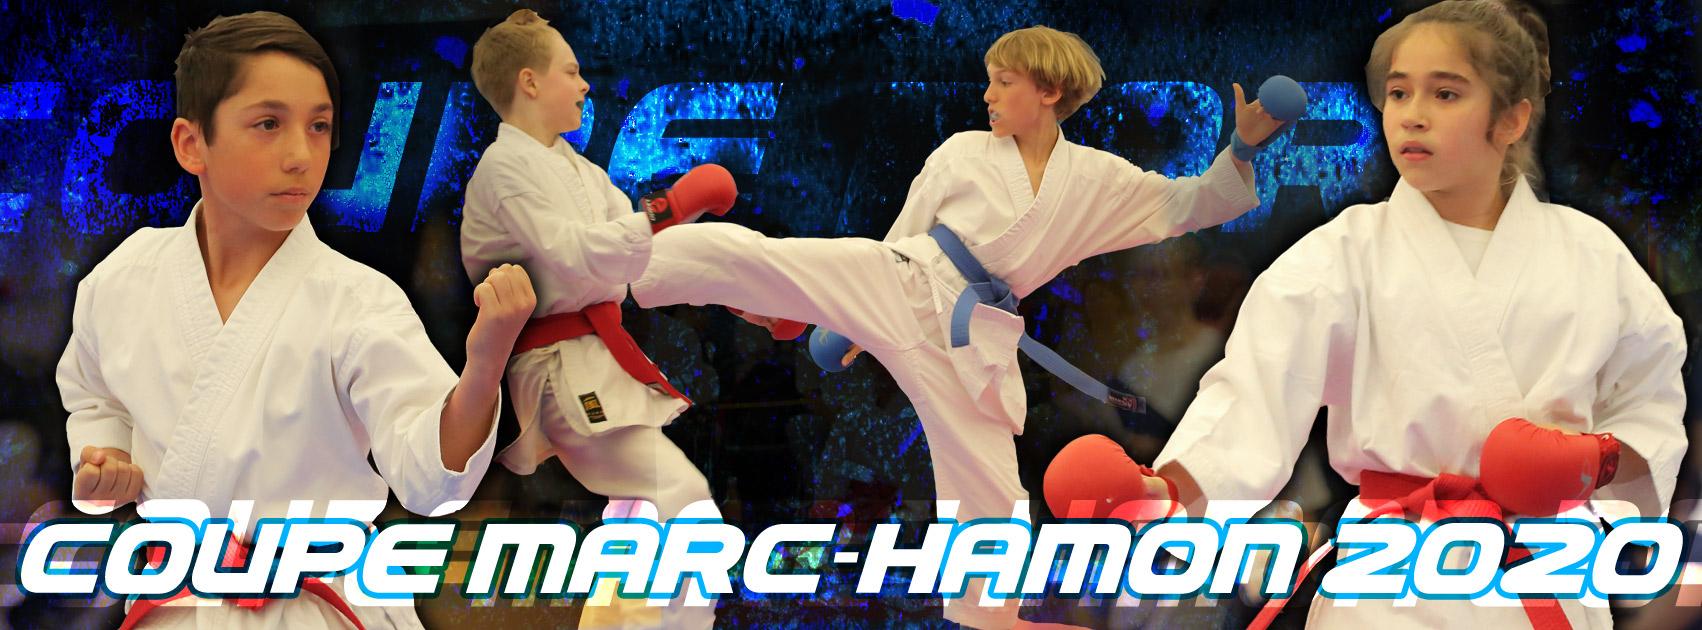 marc-hamon2020